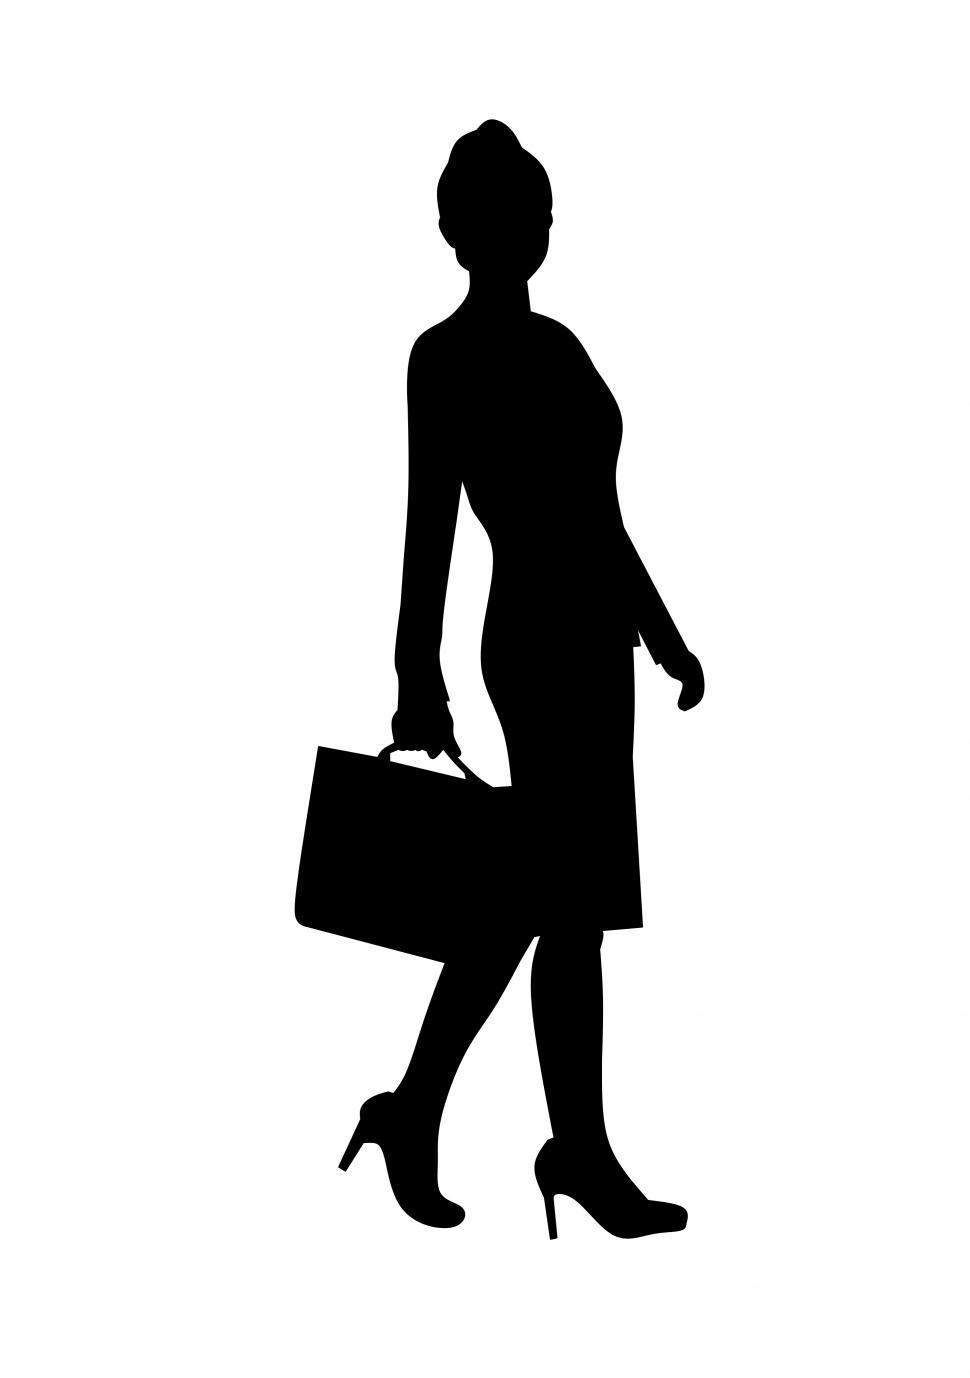 Download Free Stock HD Photo of Walking businesswoman silhouette   Online